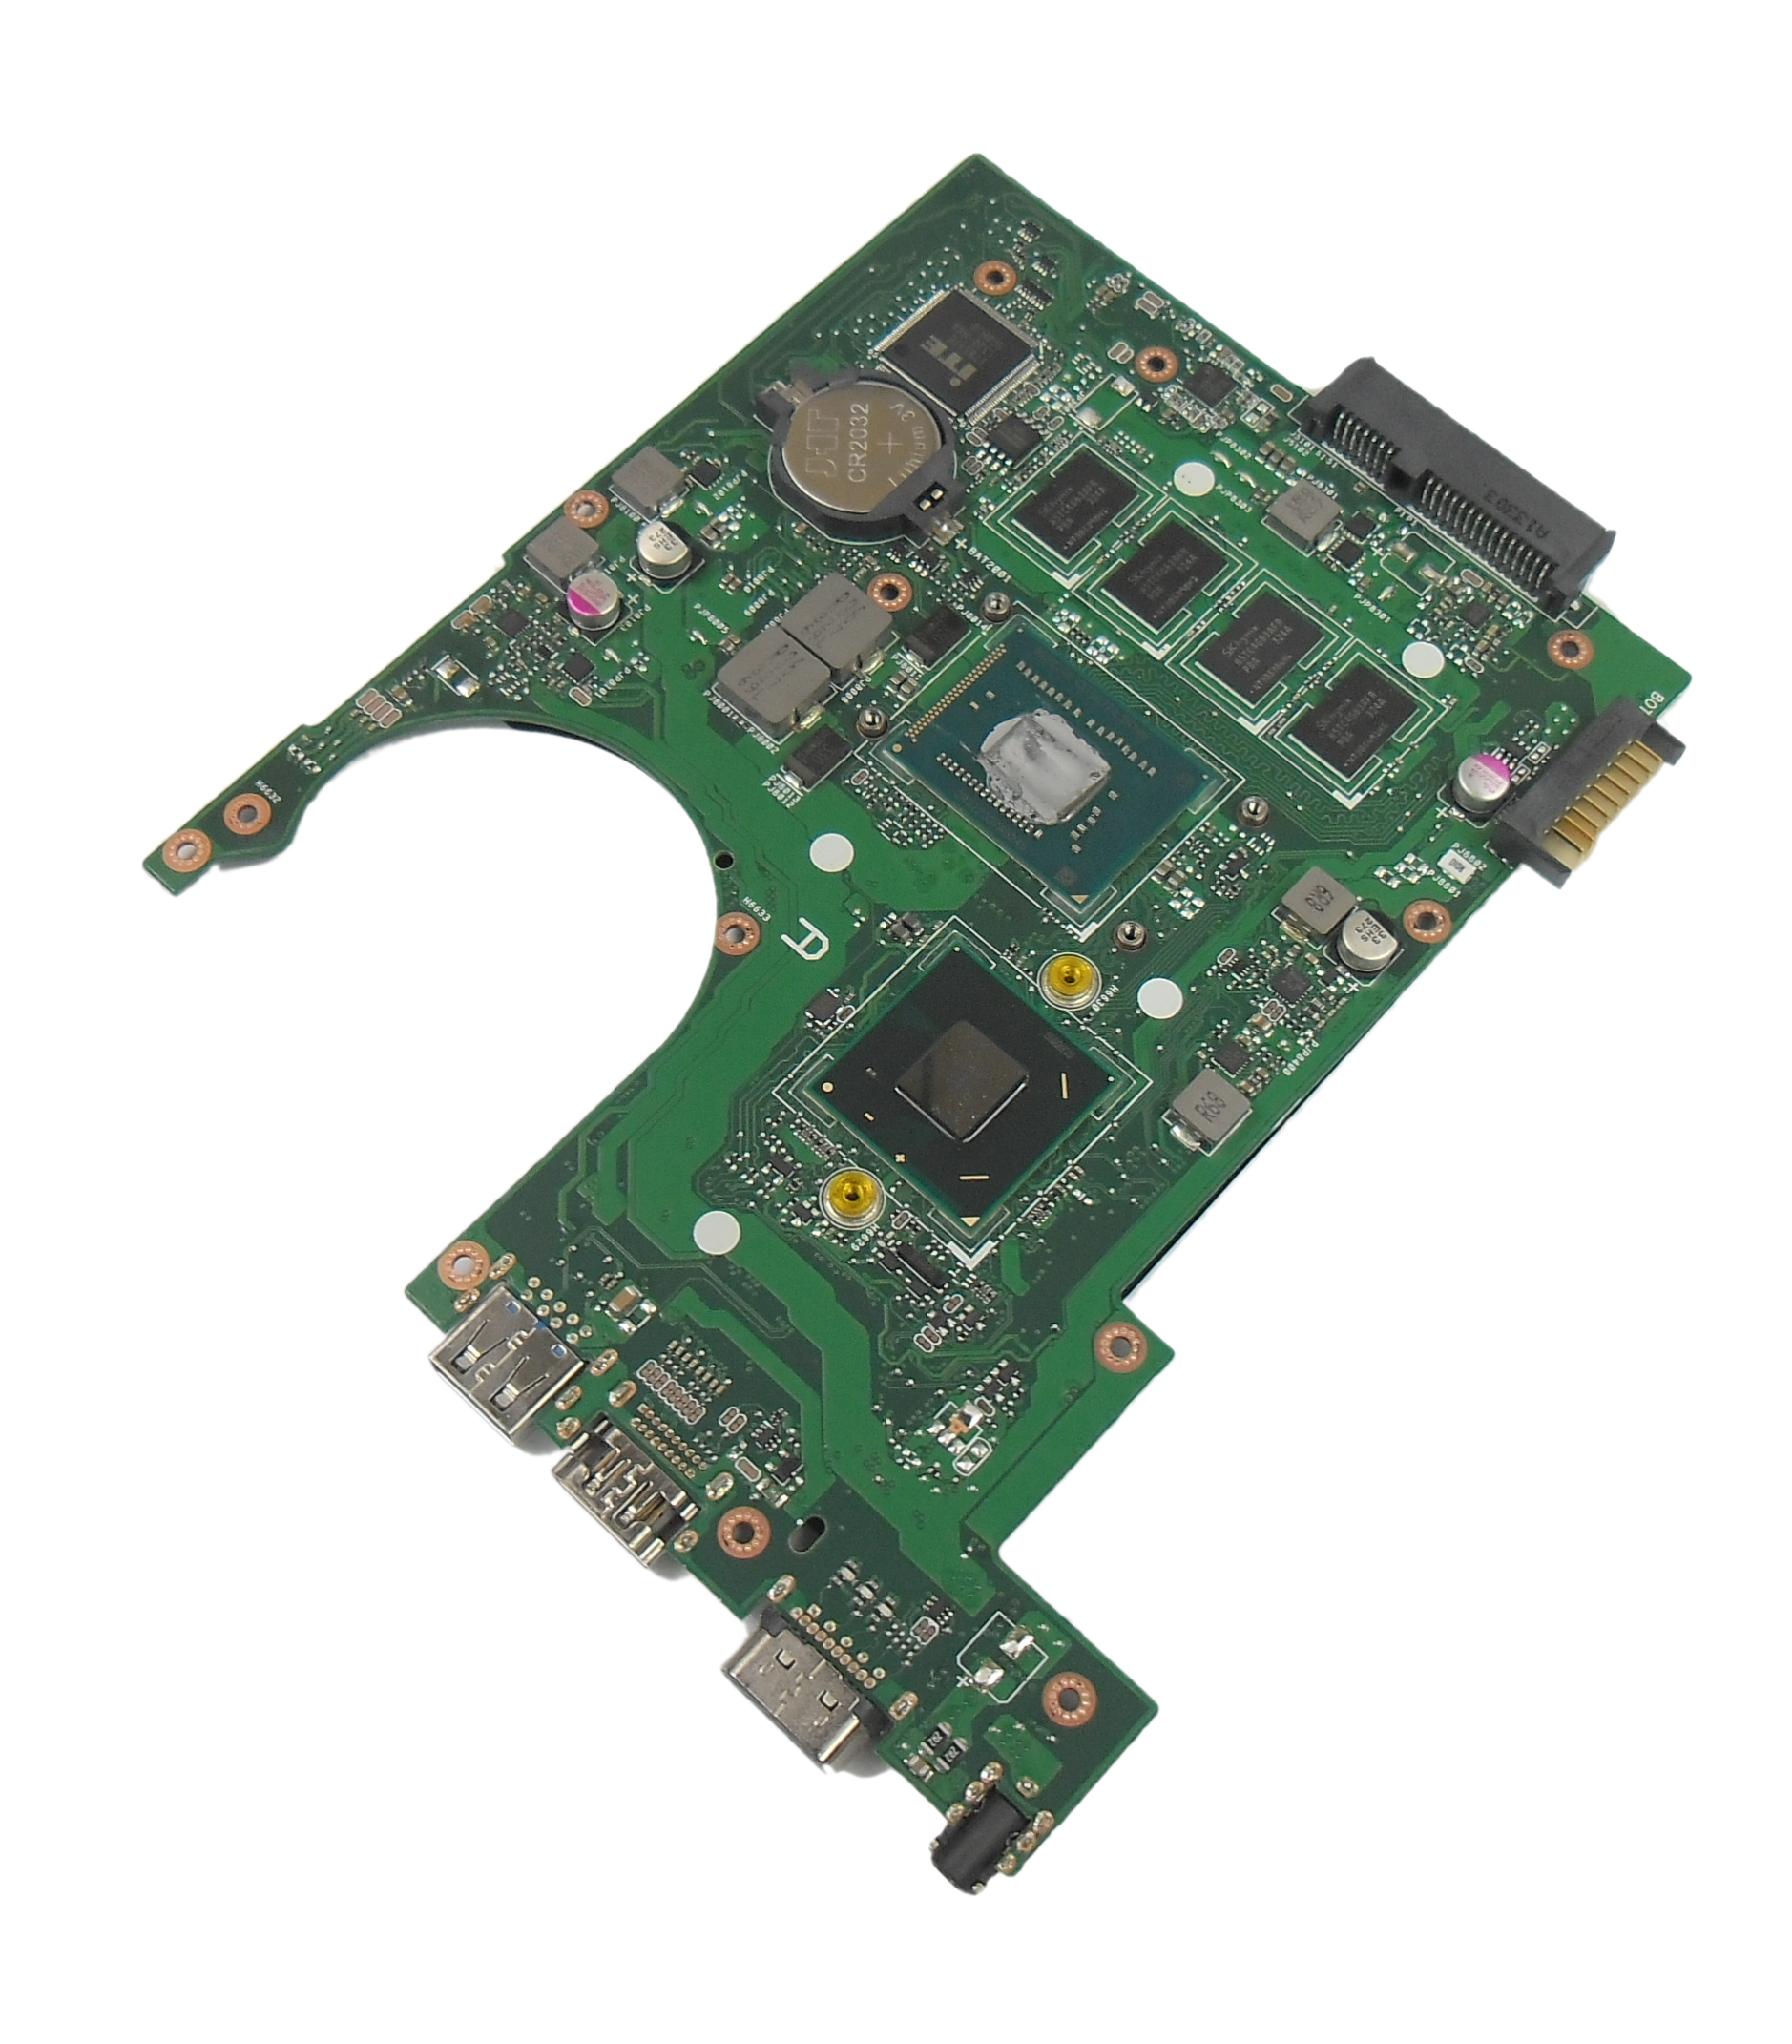 60NB02X0-MB3020-212 Asus VivoBook X200CA Motherboard with Celeron 1007U CPU